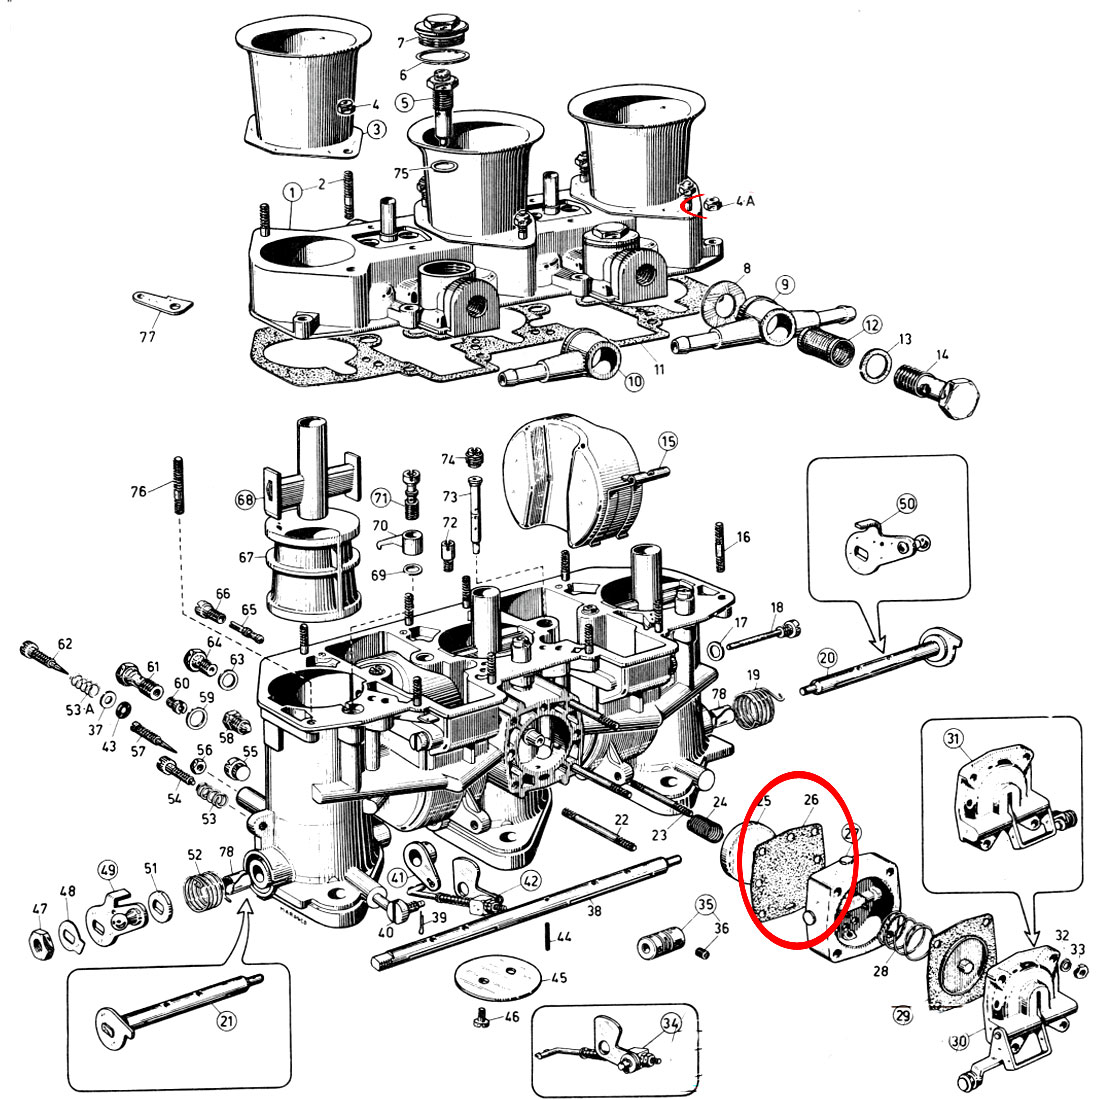 hight resolution of ford motorcraft carburetors imageresizertool com ford 2100 carburetor vacuum diagram motorcraft 2100 carburetor diagram